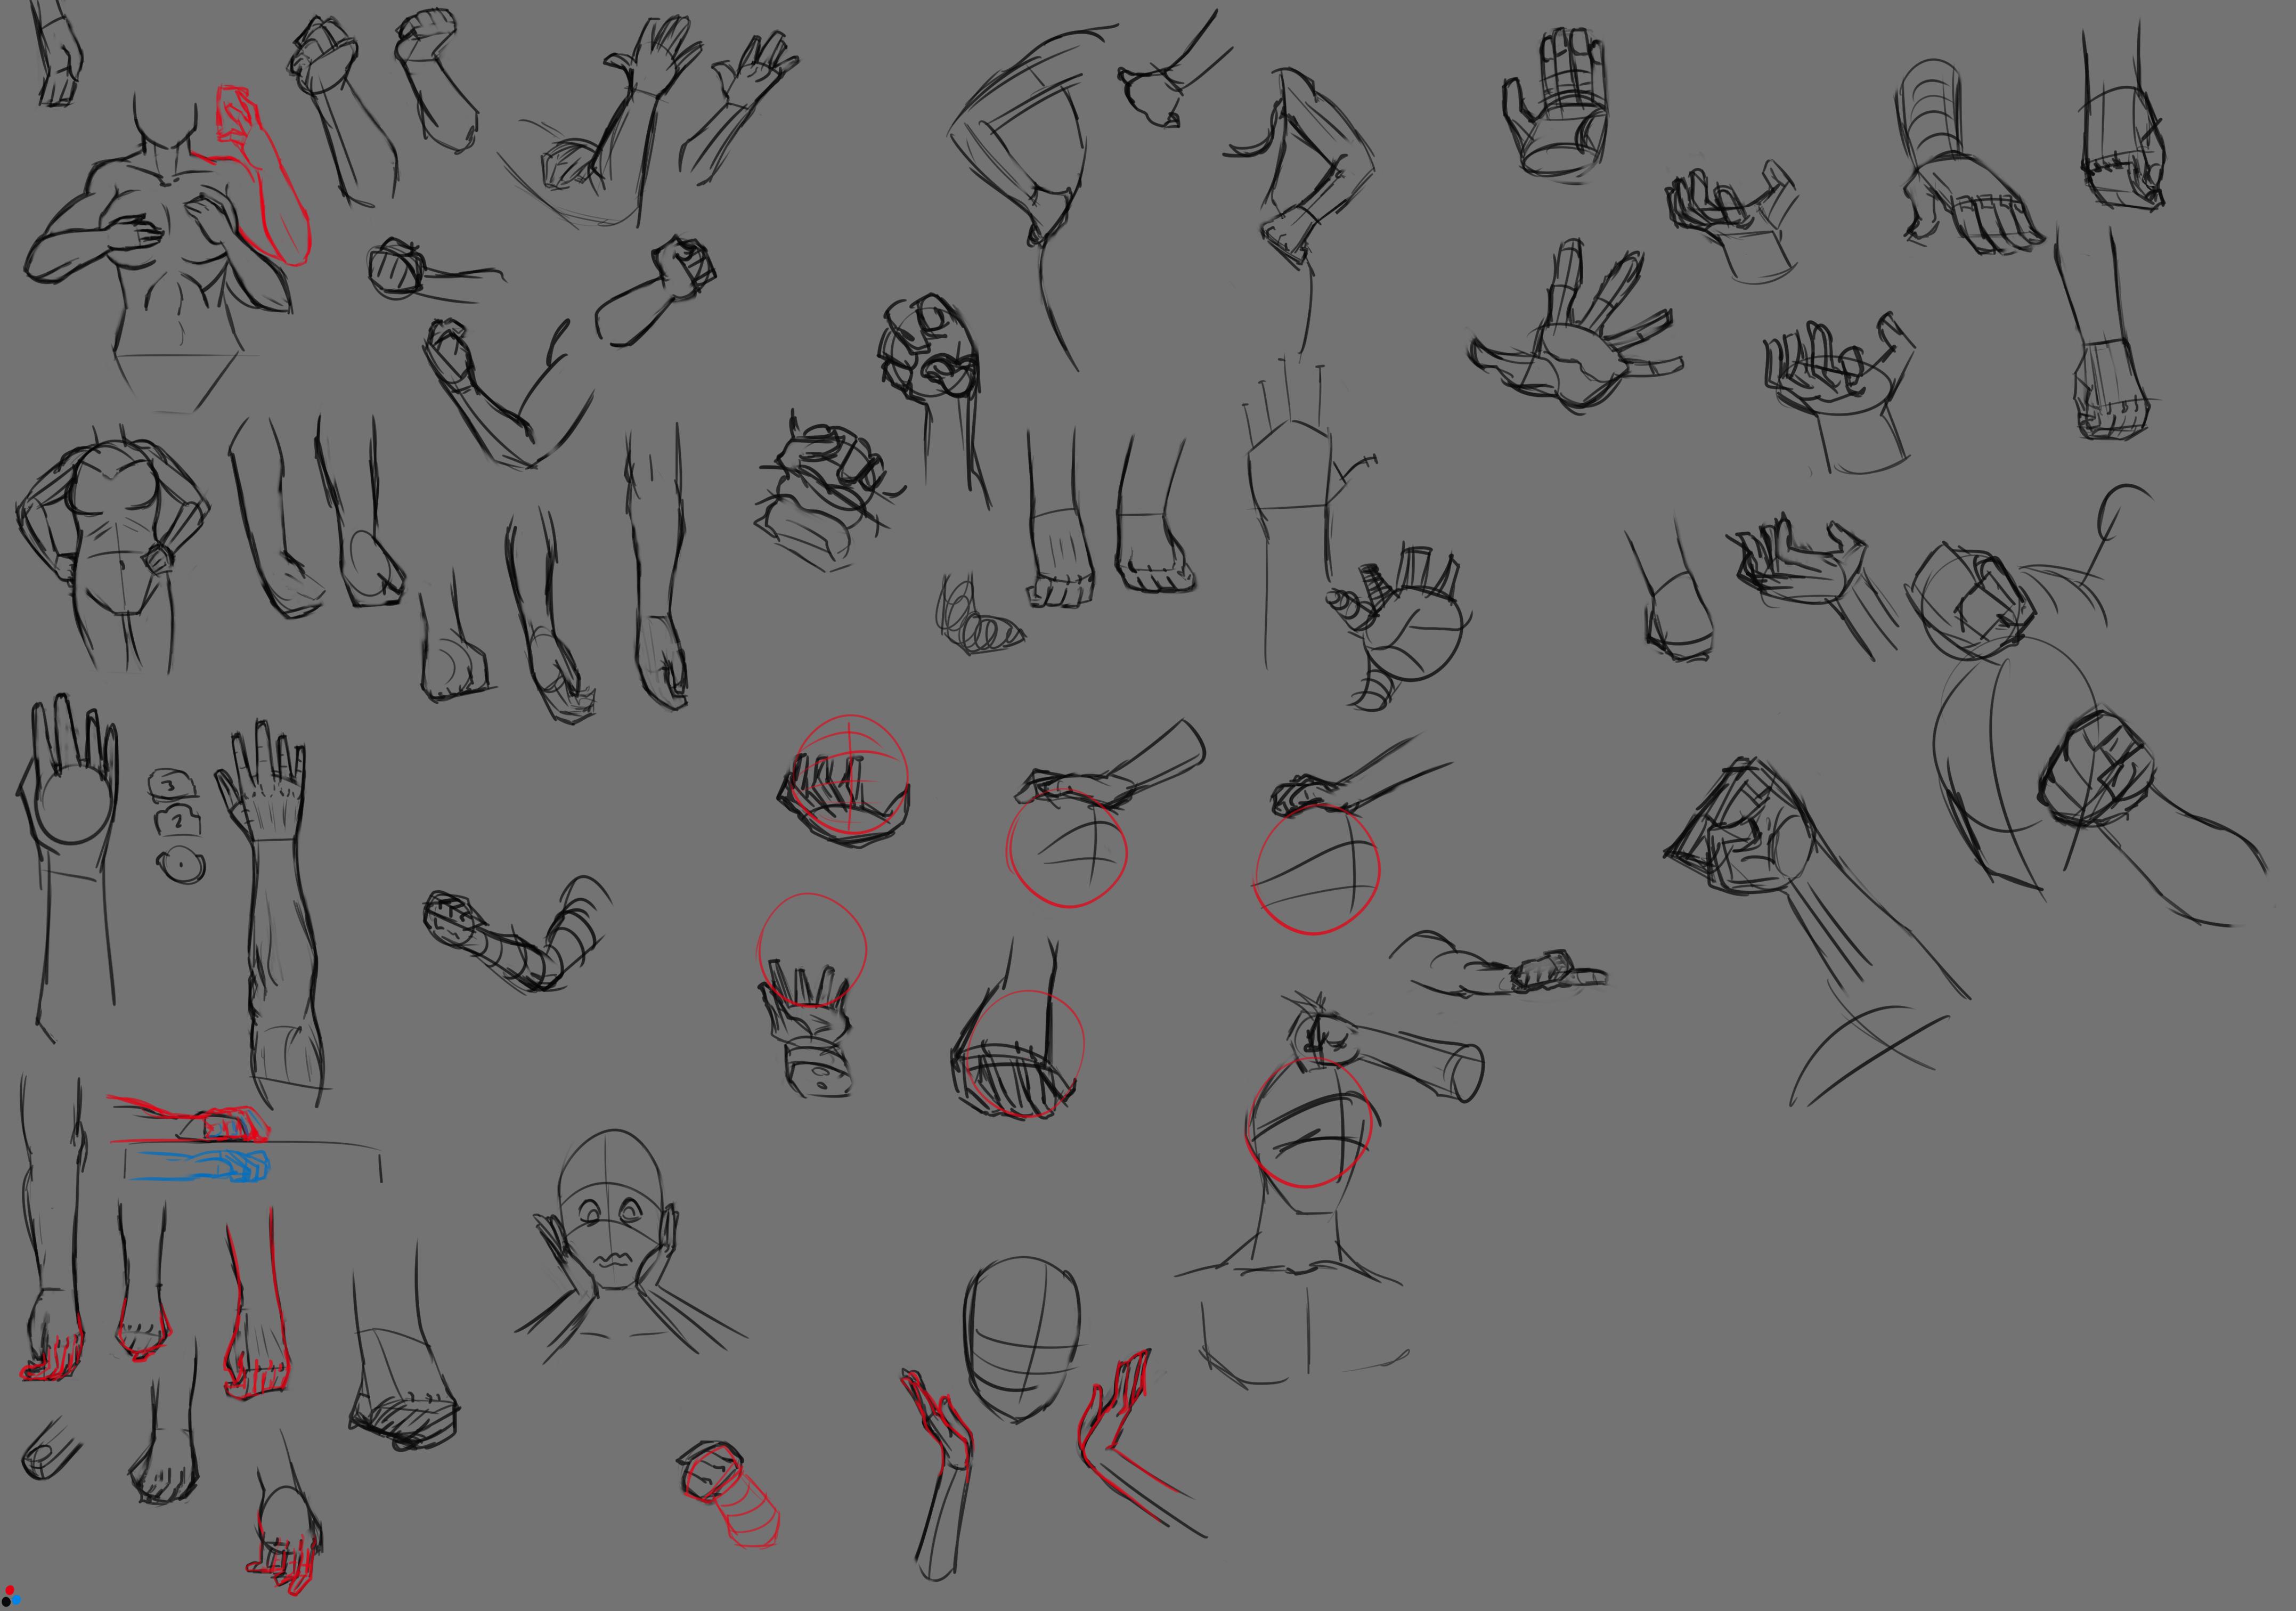 Hand studies sketches